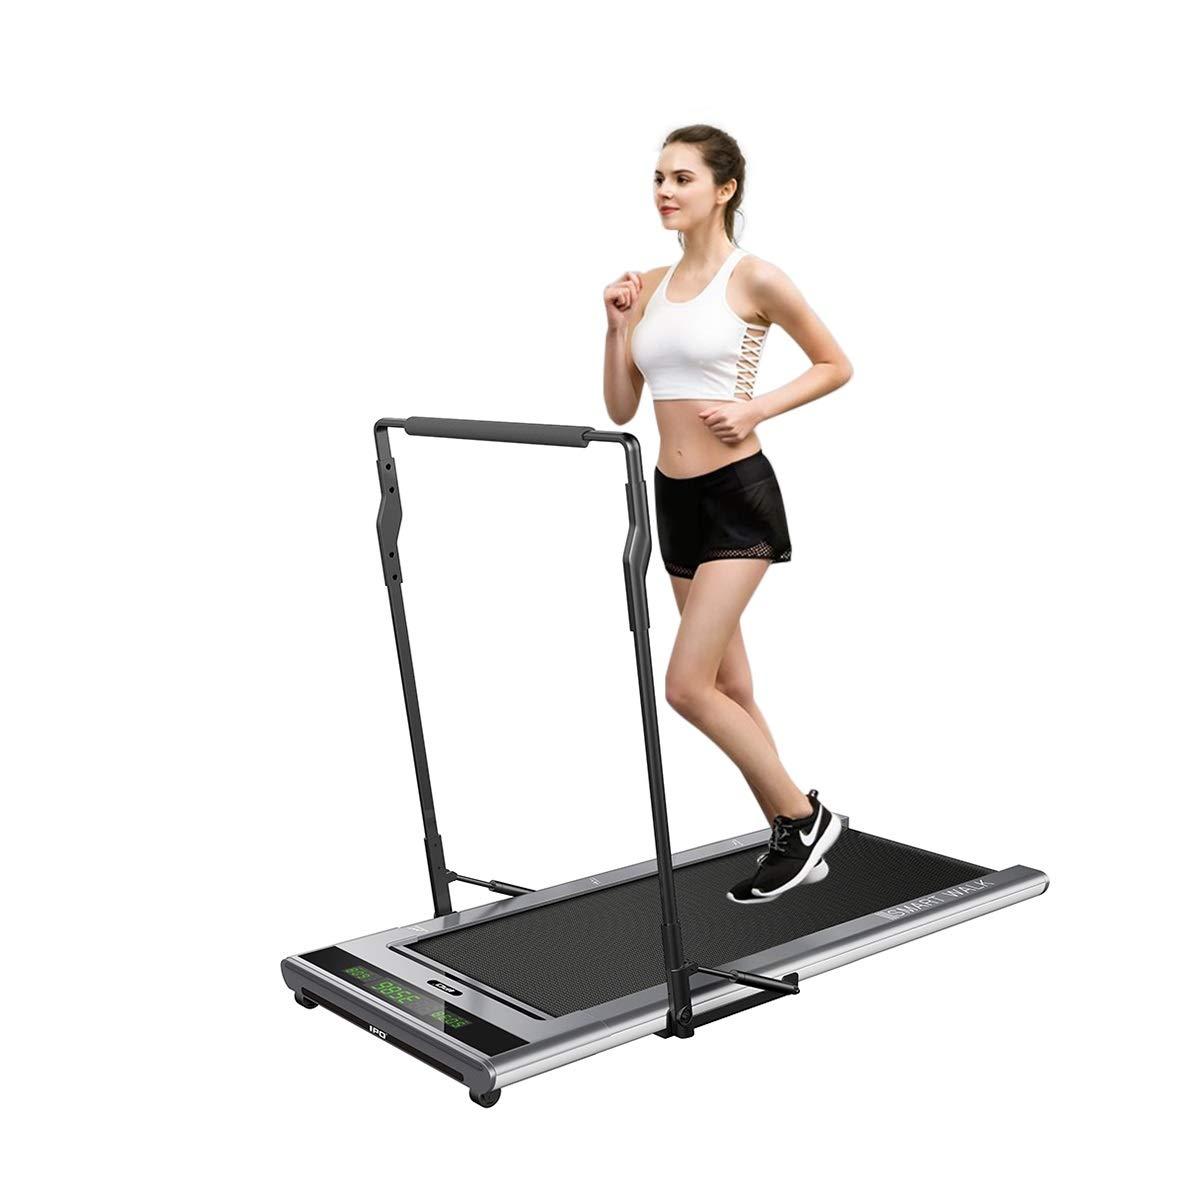 IPO Treadmill Smart Walk Slim Tread Folding Treadmill Intelligent Speed Control Compact Treadmill Under Desk